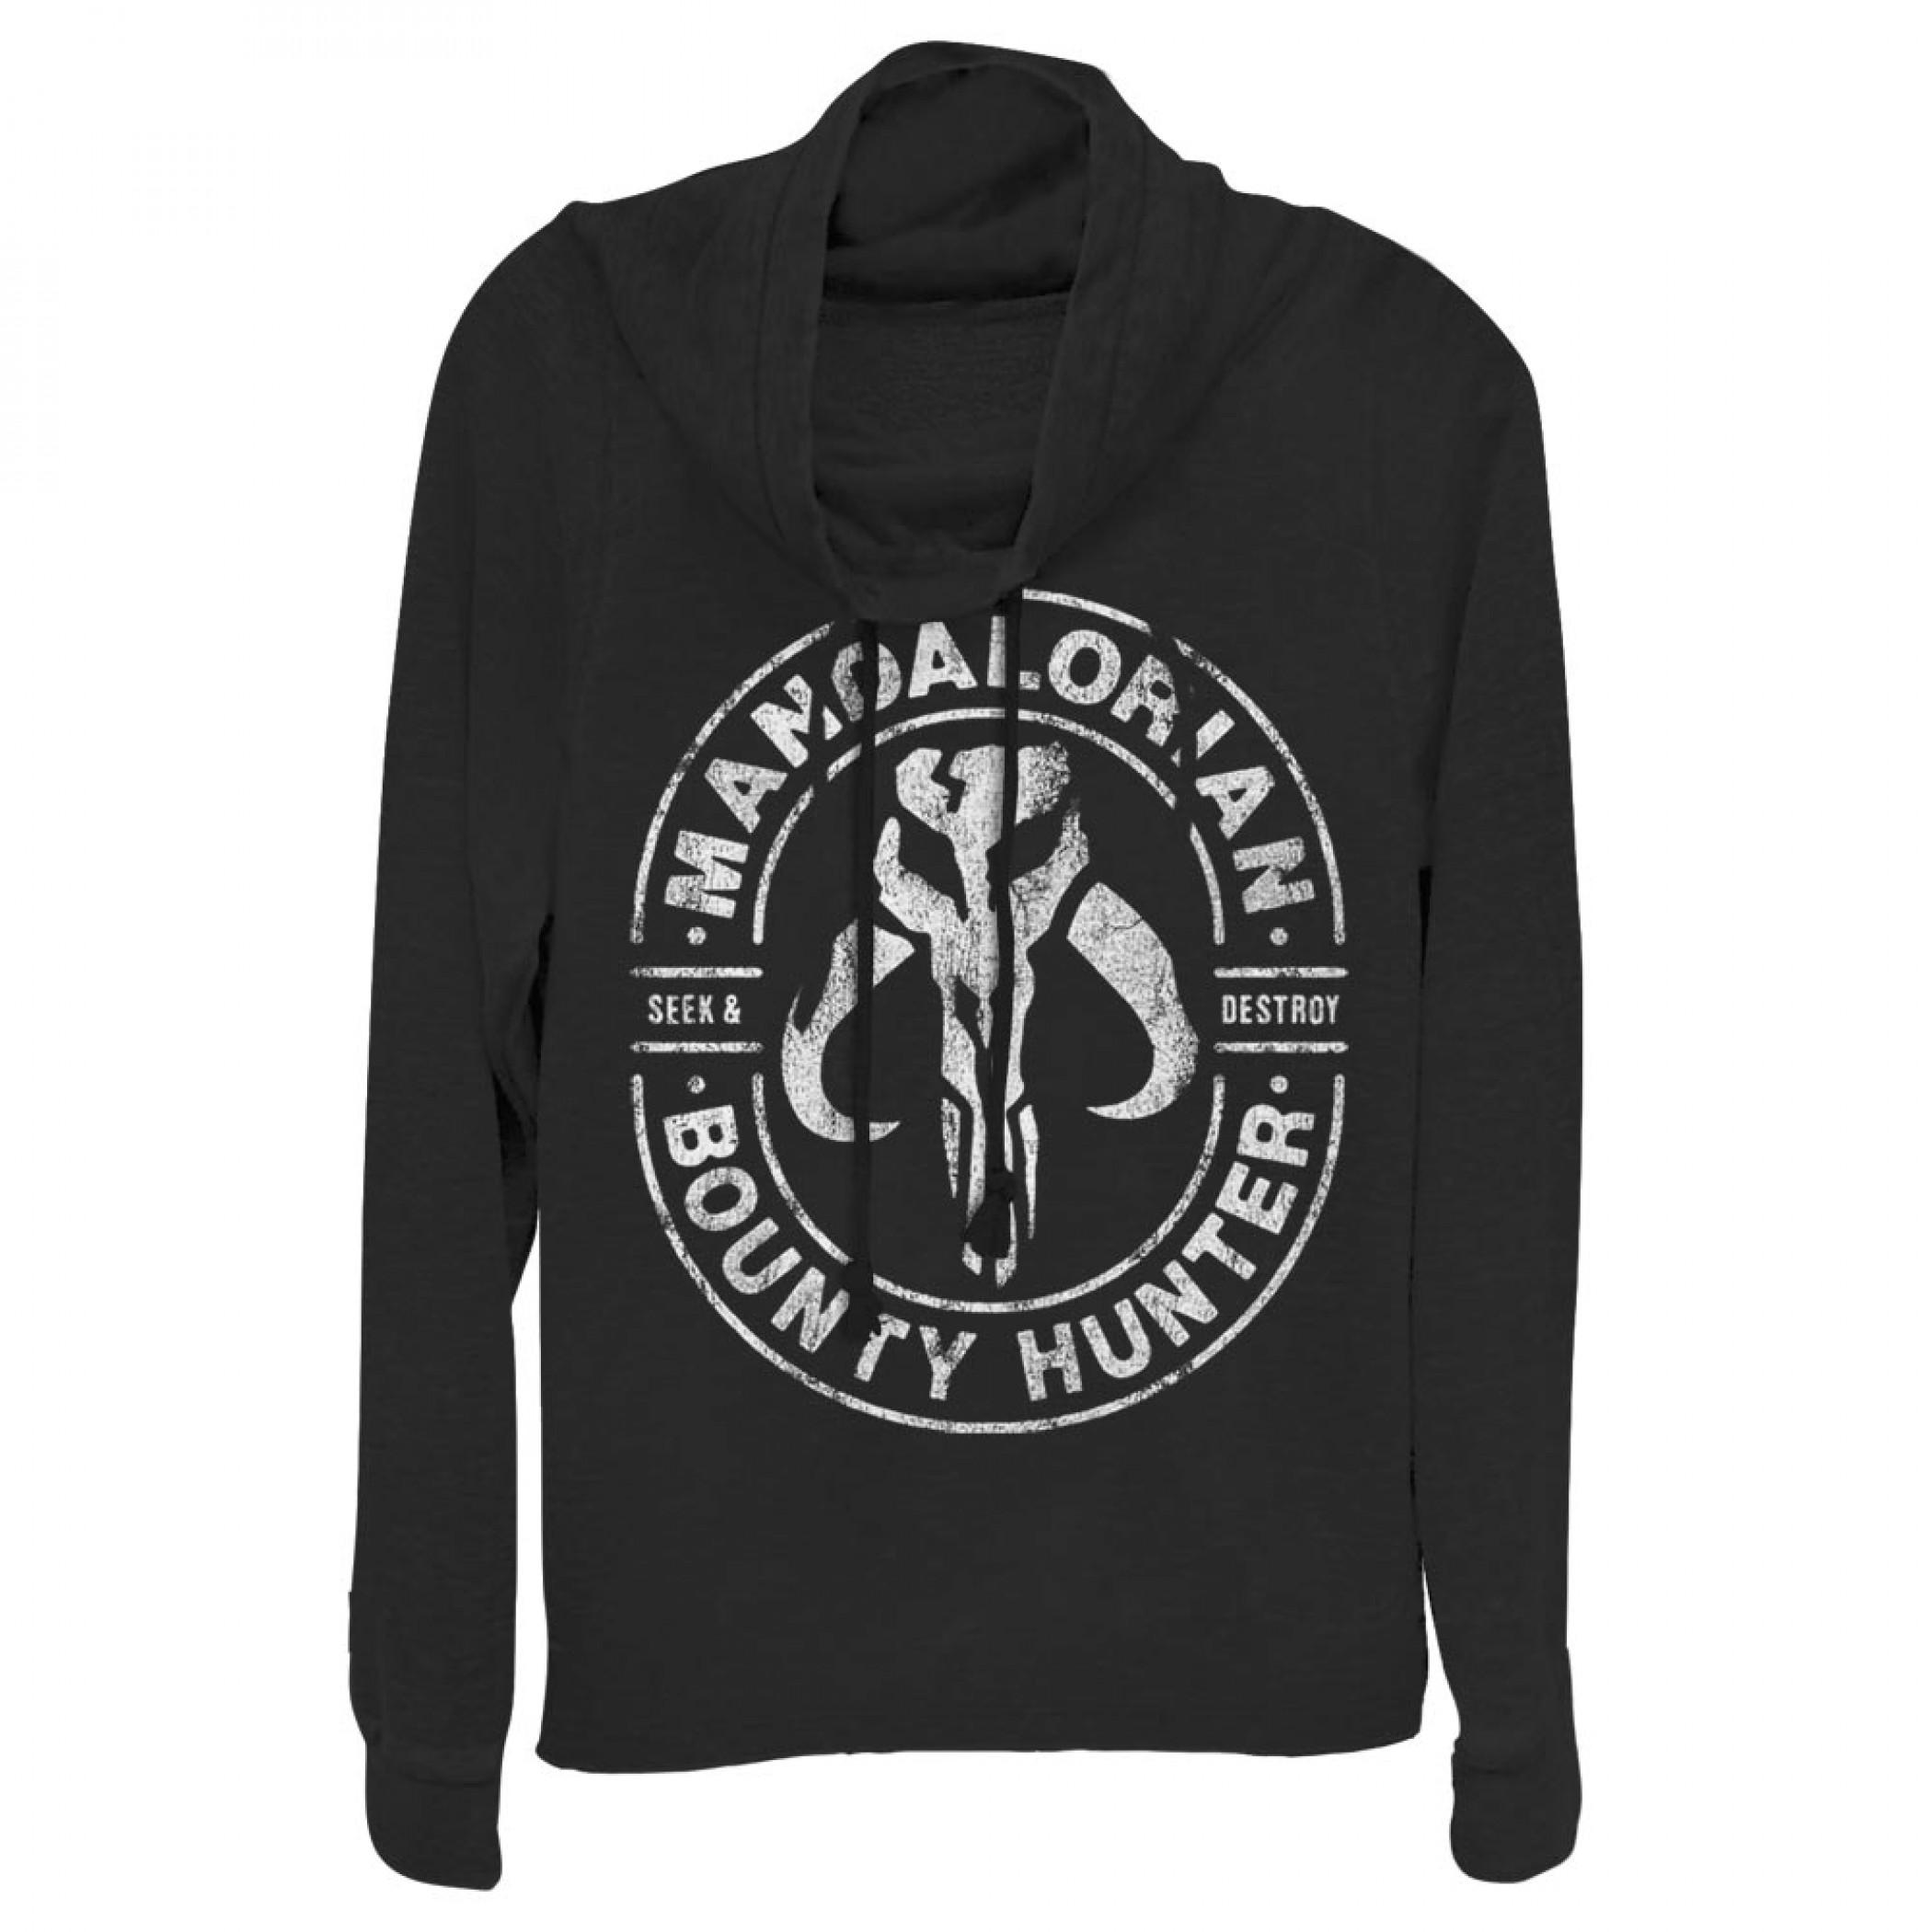 The Mandalorian Seek and Destroy Women's Cowl Neck Sweatshirt